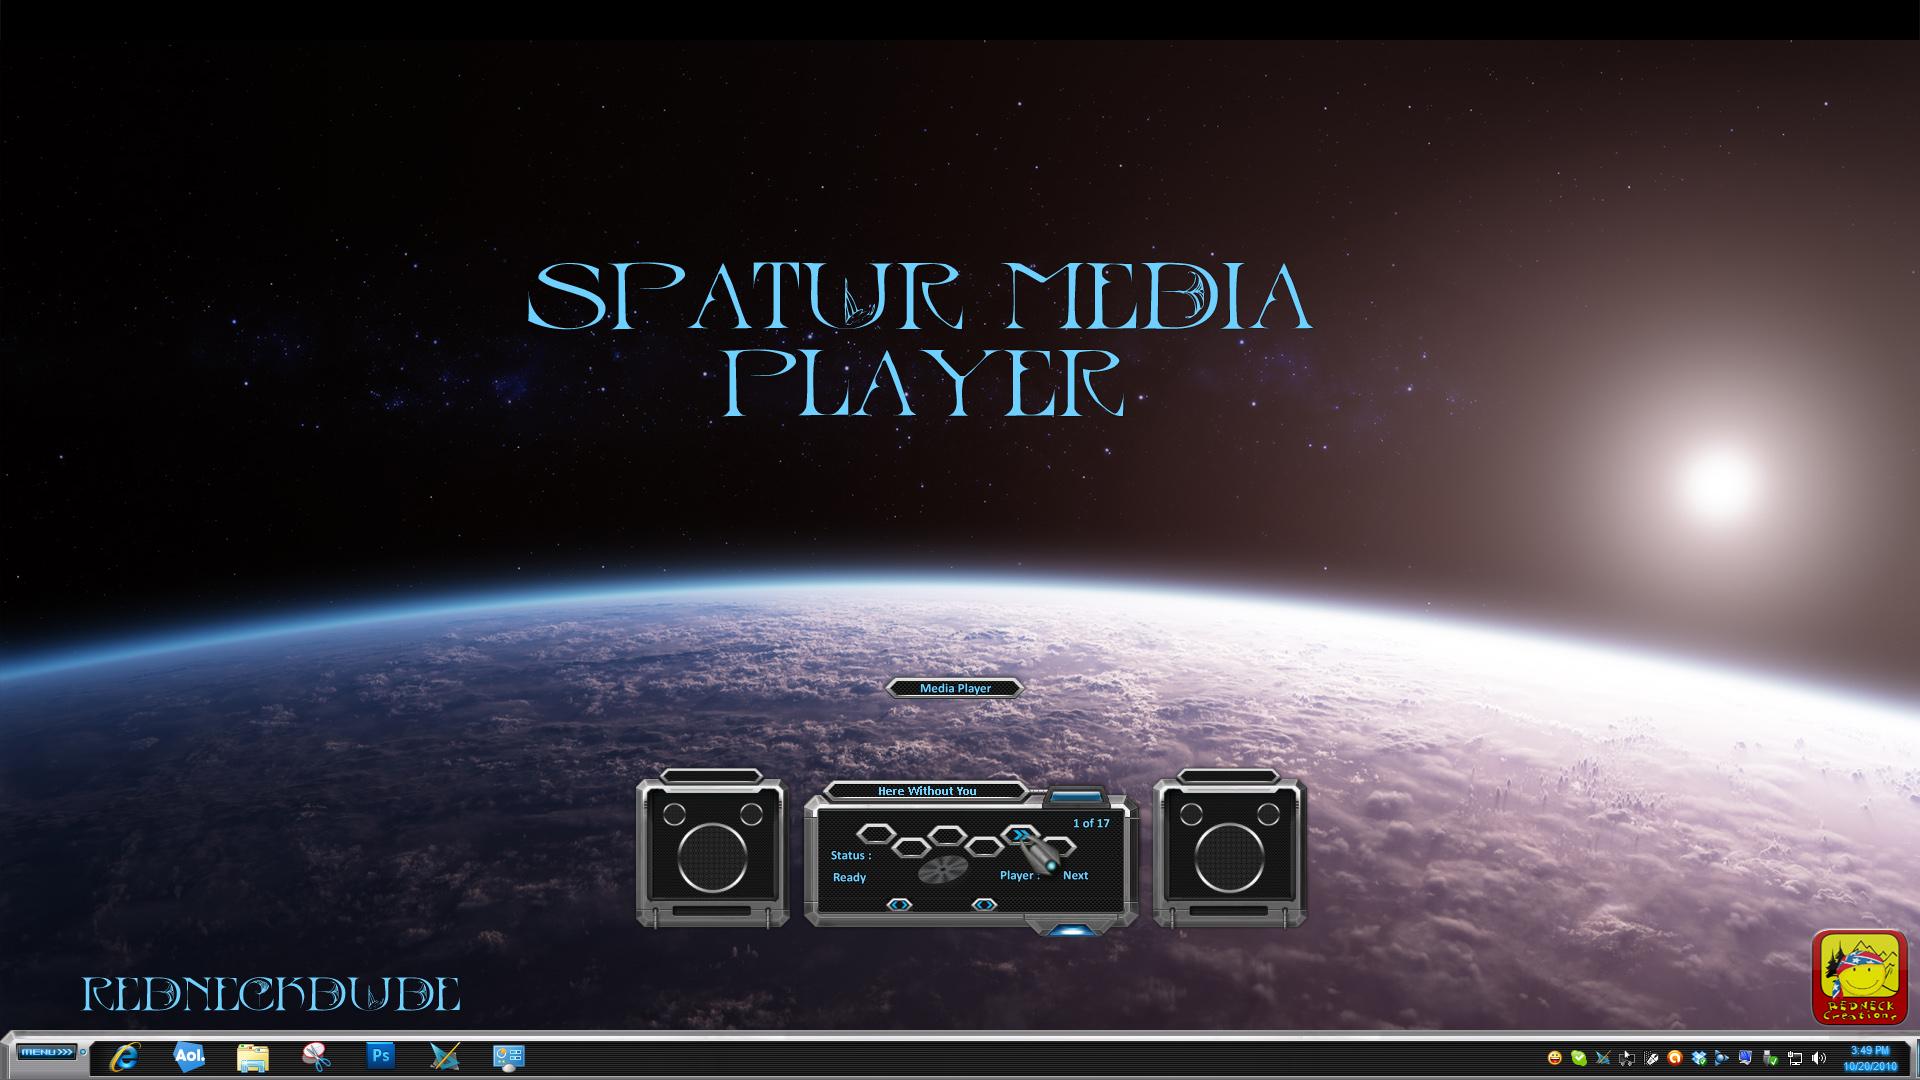 SPatur Media Player